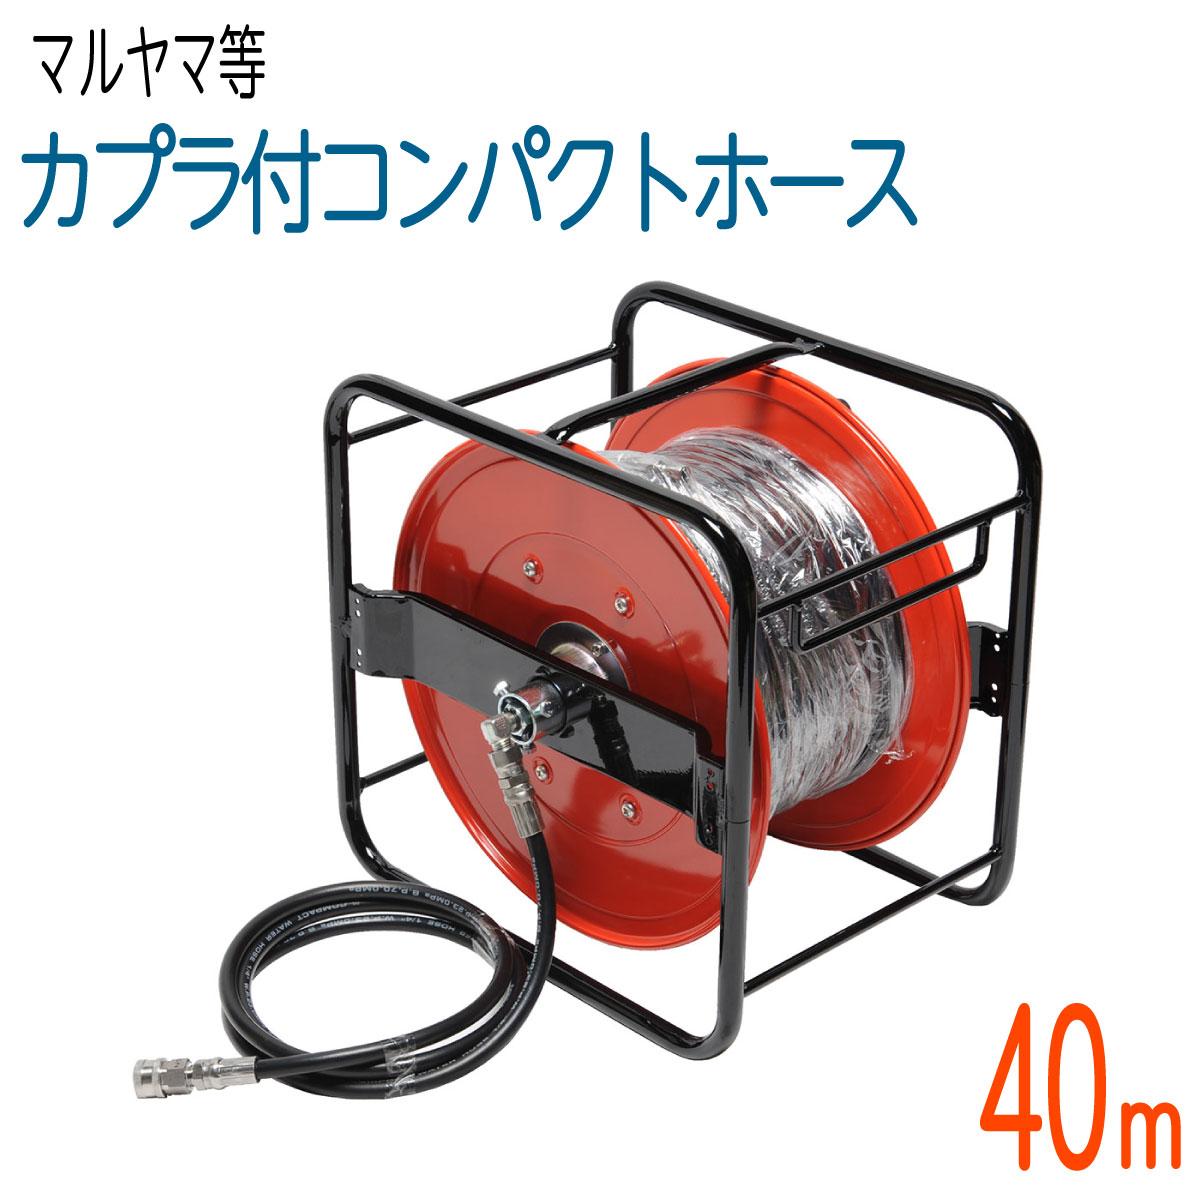 40Mリール巻き 1 4 期間限定で特別価格 2分 日本全国 送料無料 コンパクトホース ワンタッチカプラ付 高圧洗浄機ホース